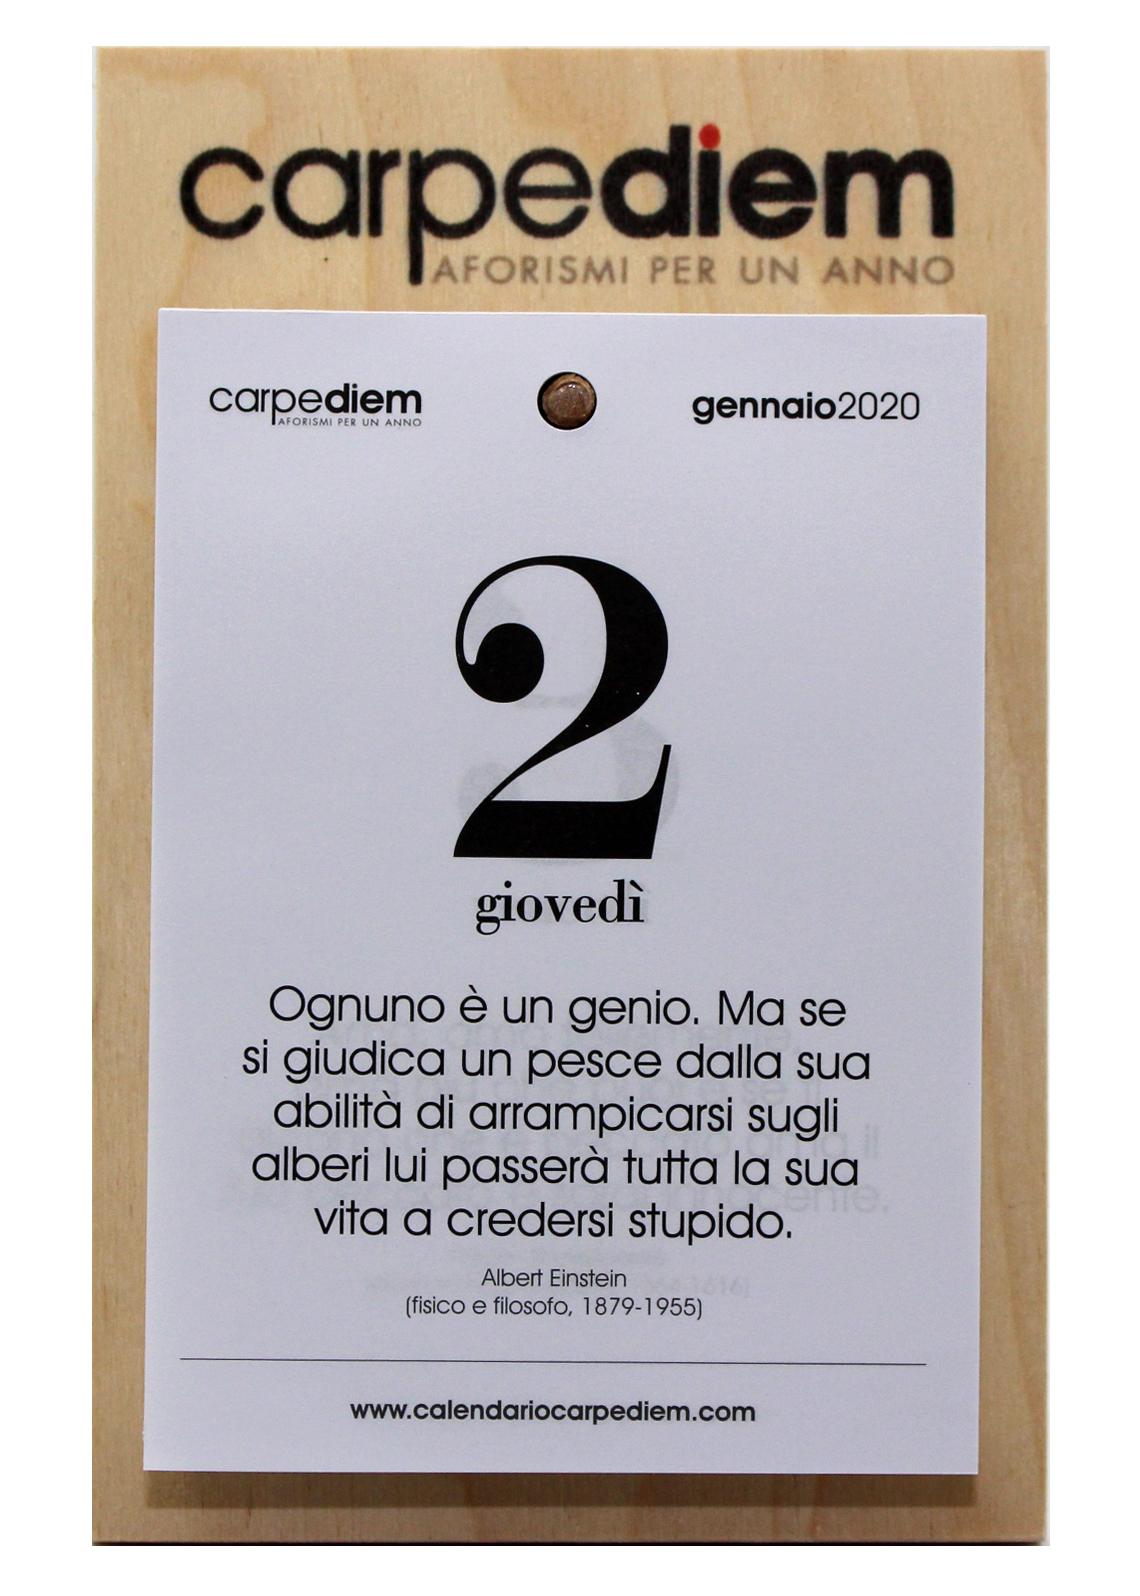 Calendario Filosofico 2020 Frasi.Carpe Diem Aforismi Per Un Anno 2020 Calendario Con Base In Legno